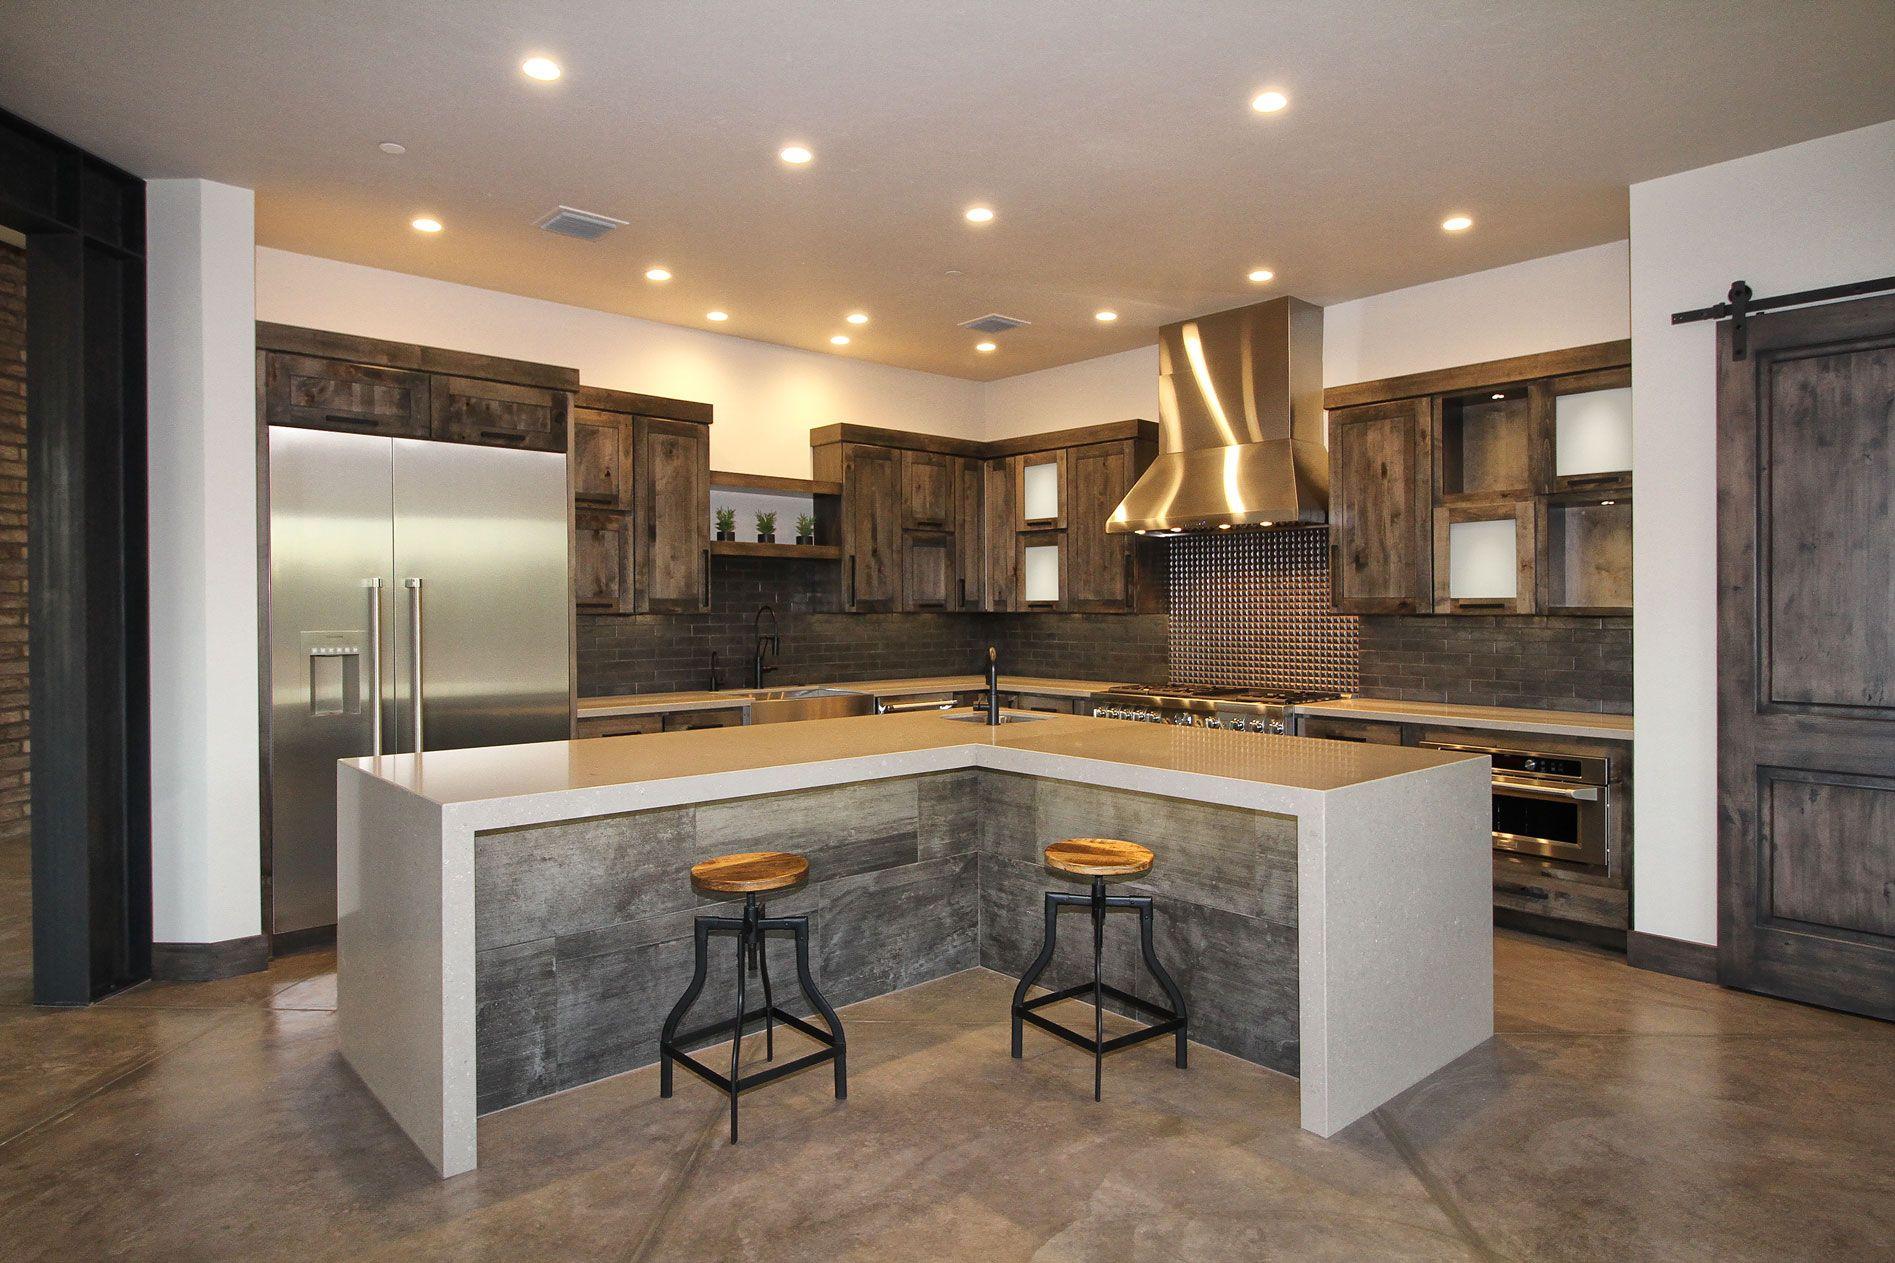 A Barn Style Kitchen Pantry Door Large Kitchen Island